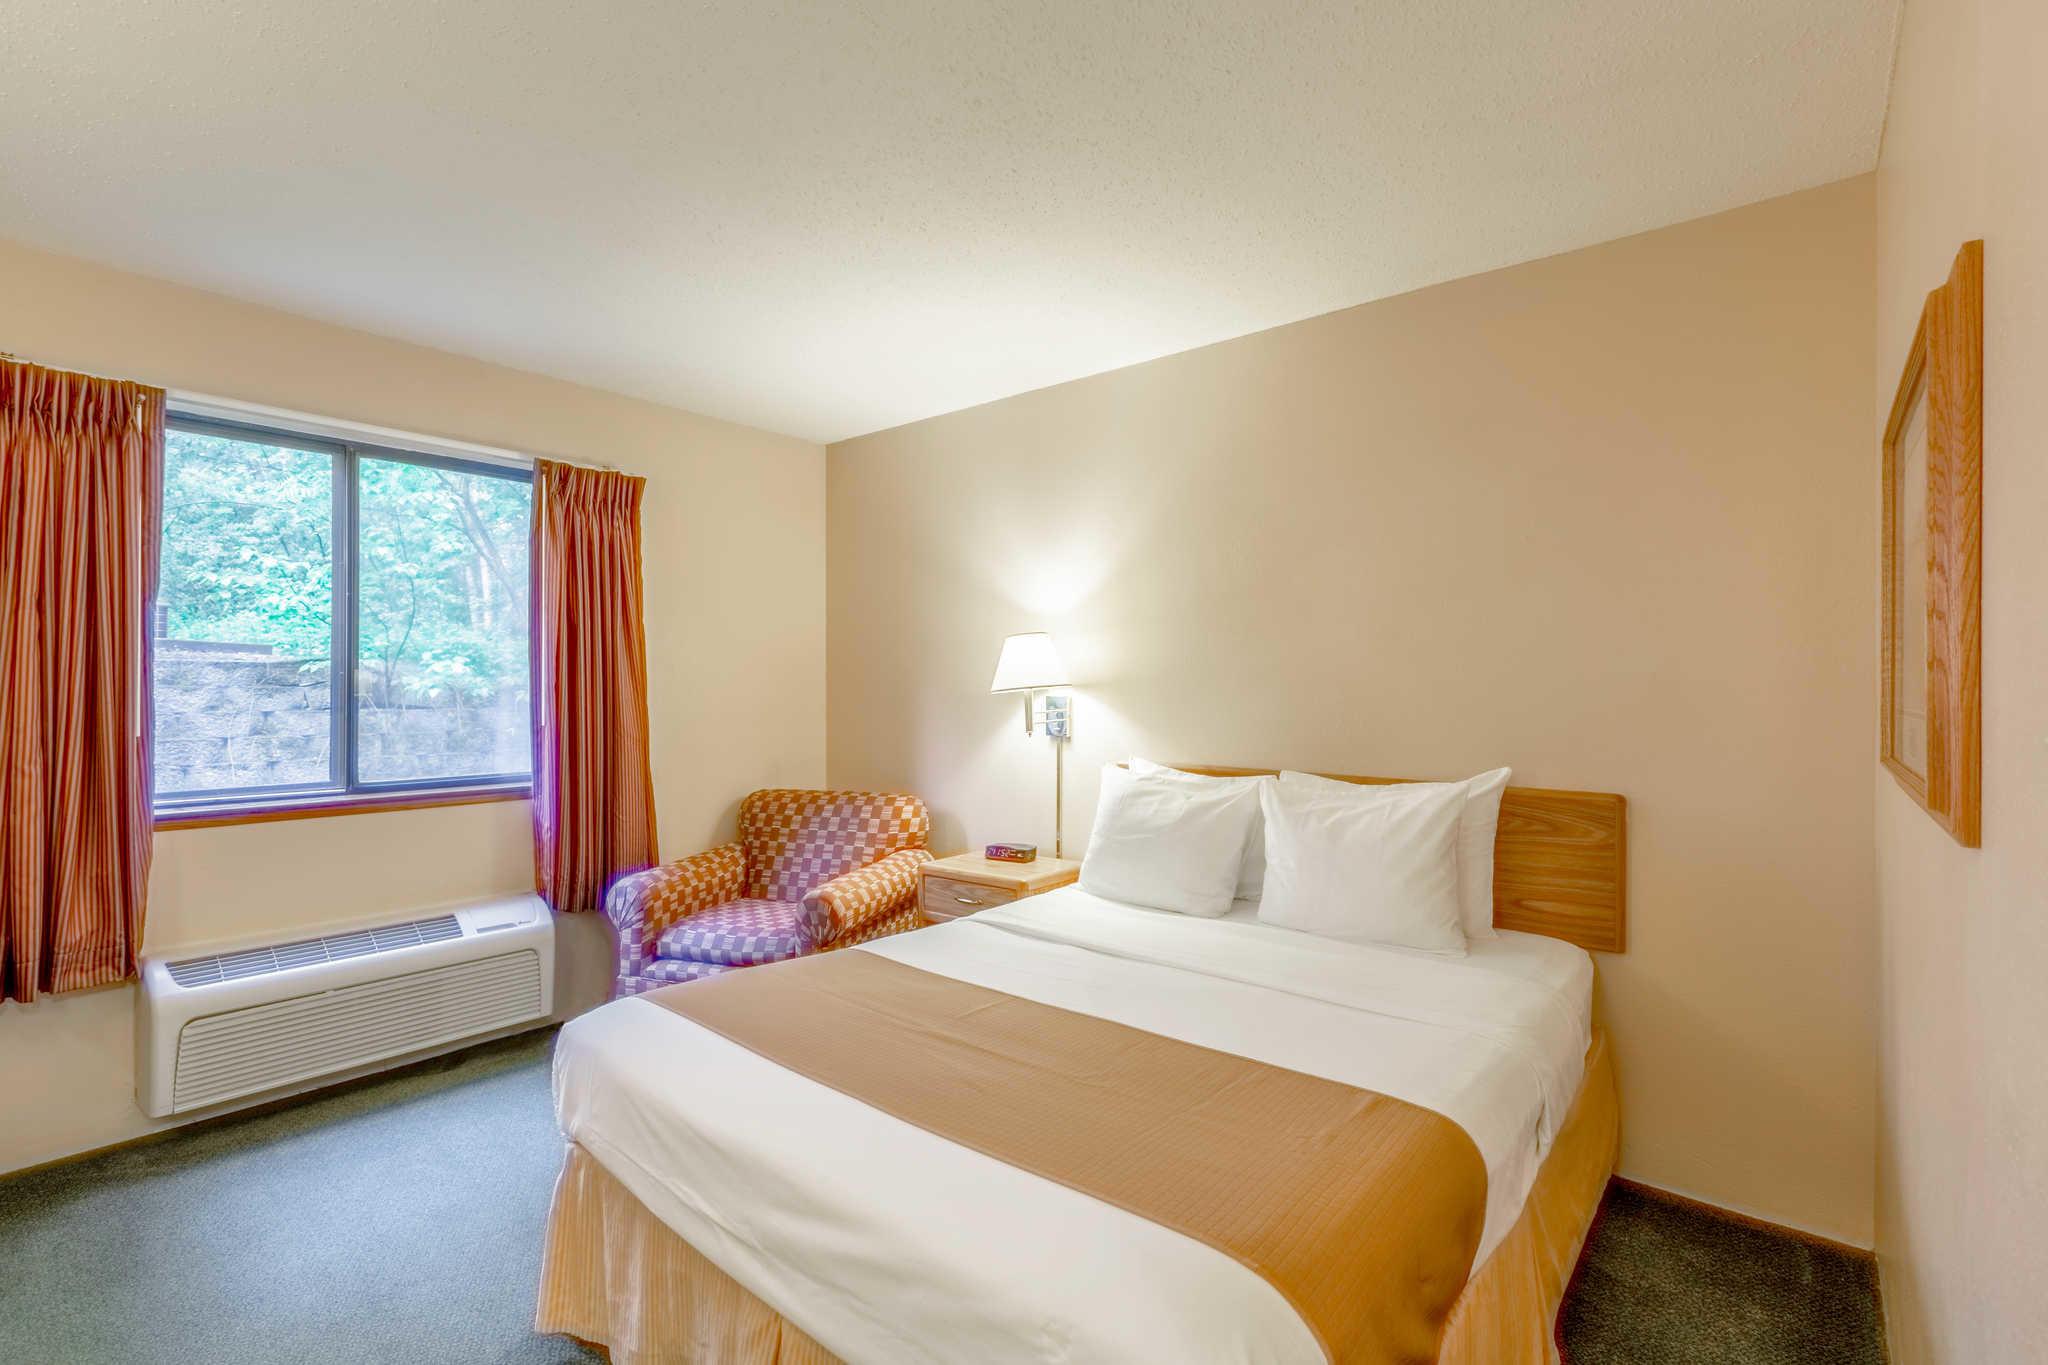 Rodeway Inn image 10